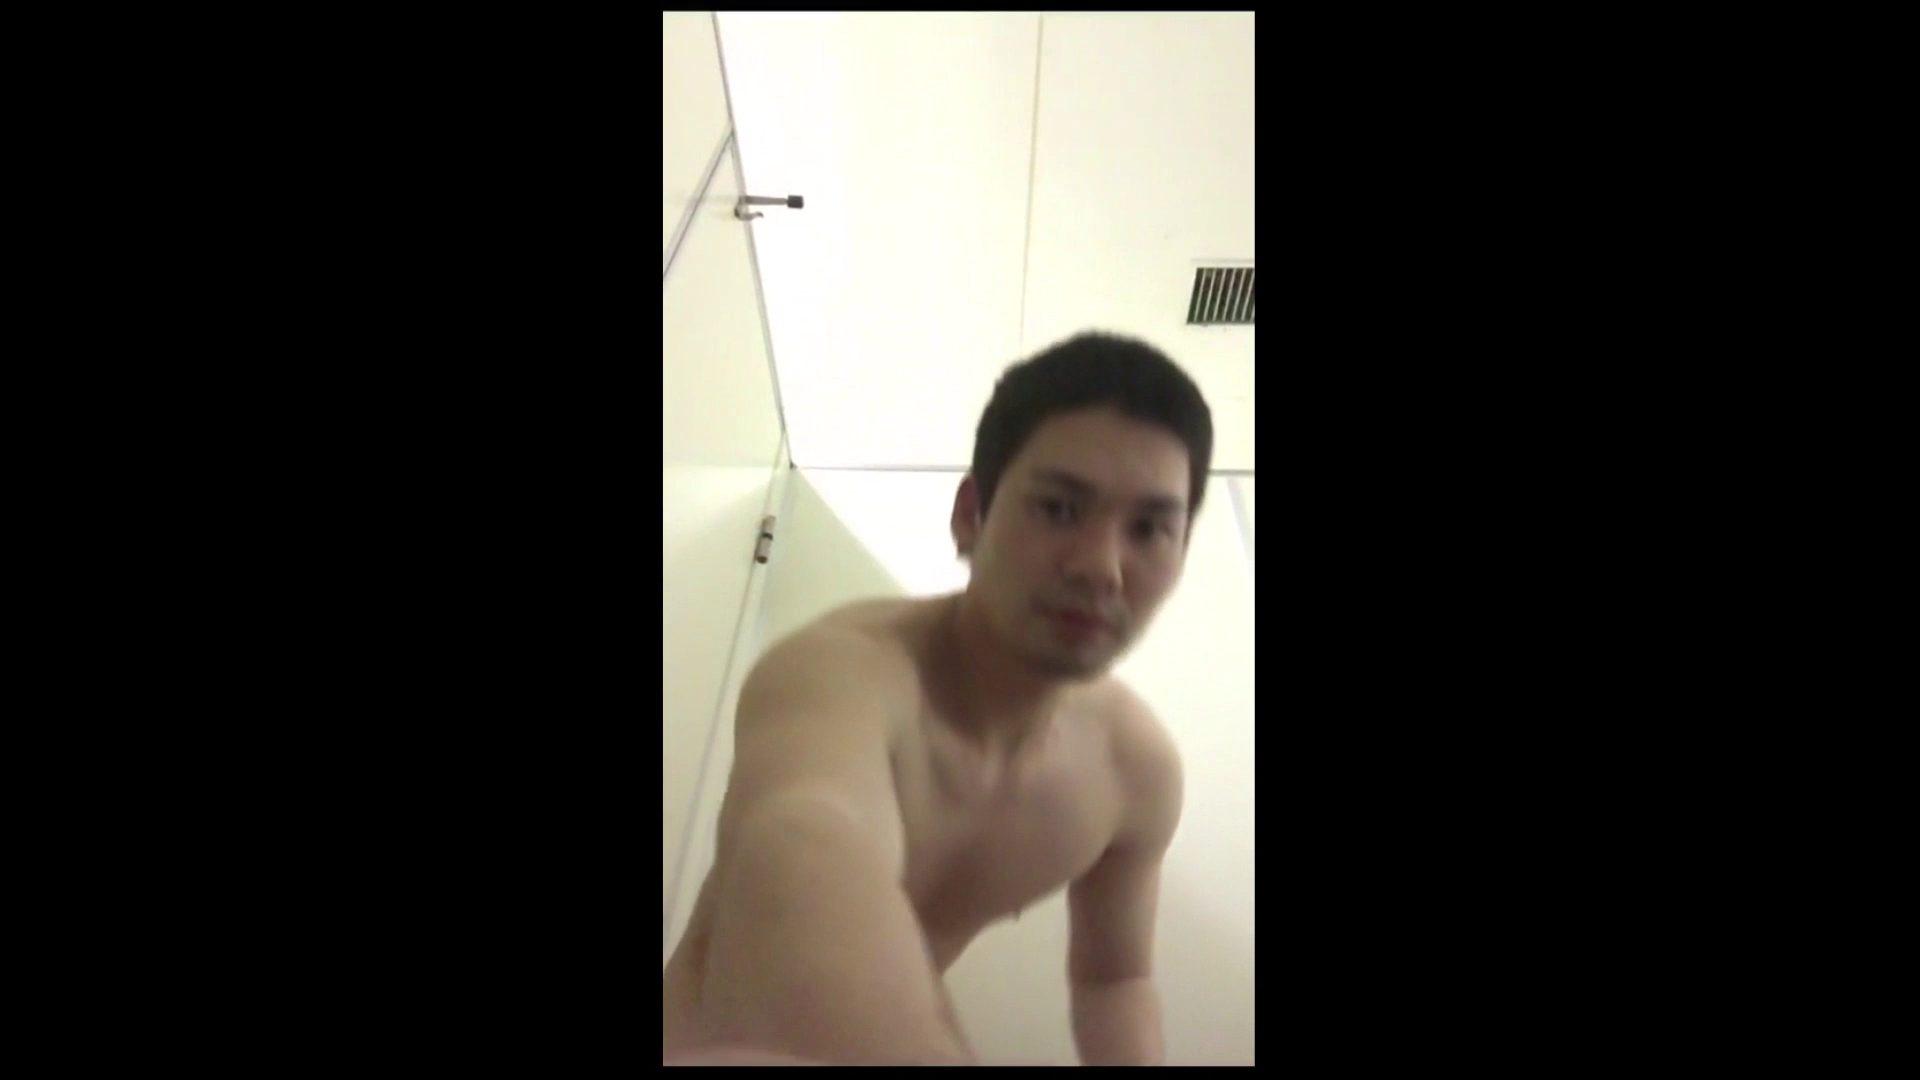 個人撮影 自慰の極意 Vol.3 無修正 ゲイ無修正動画画像 111pic 84